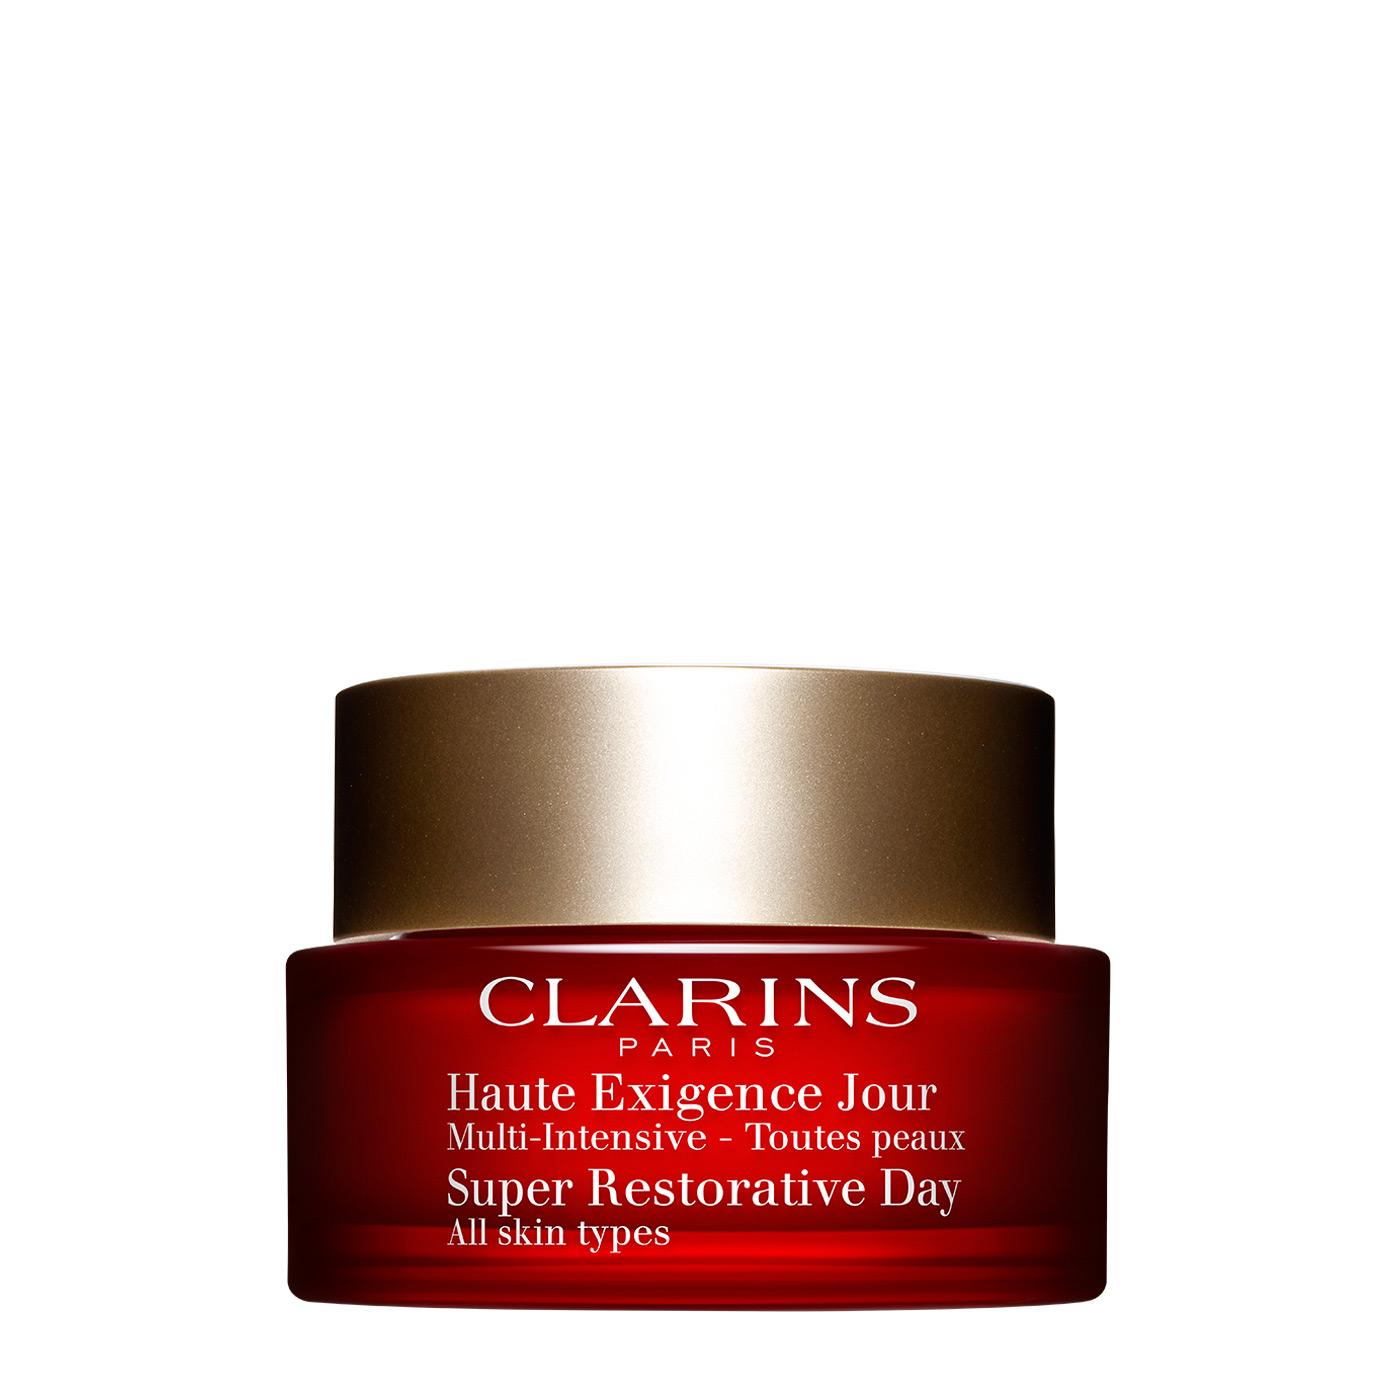 Clarins Creme Haute Exigence Jour Multi Intensive 50 ml tutti i tipi di pelle